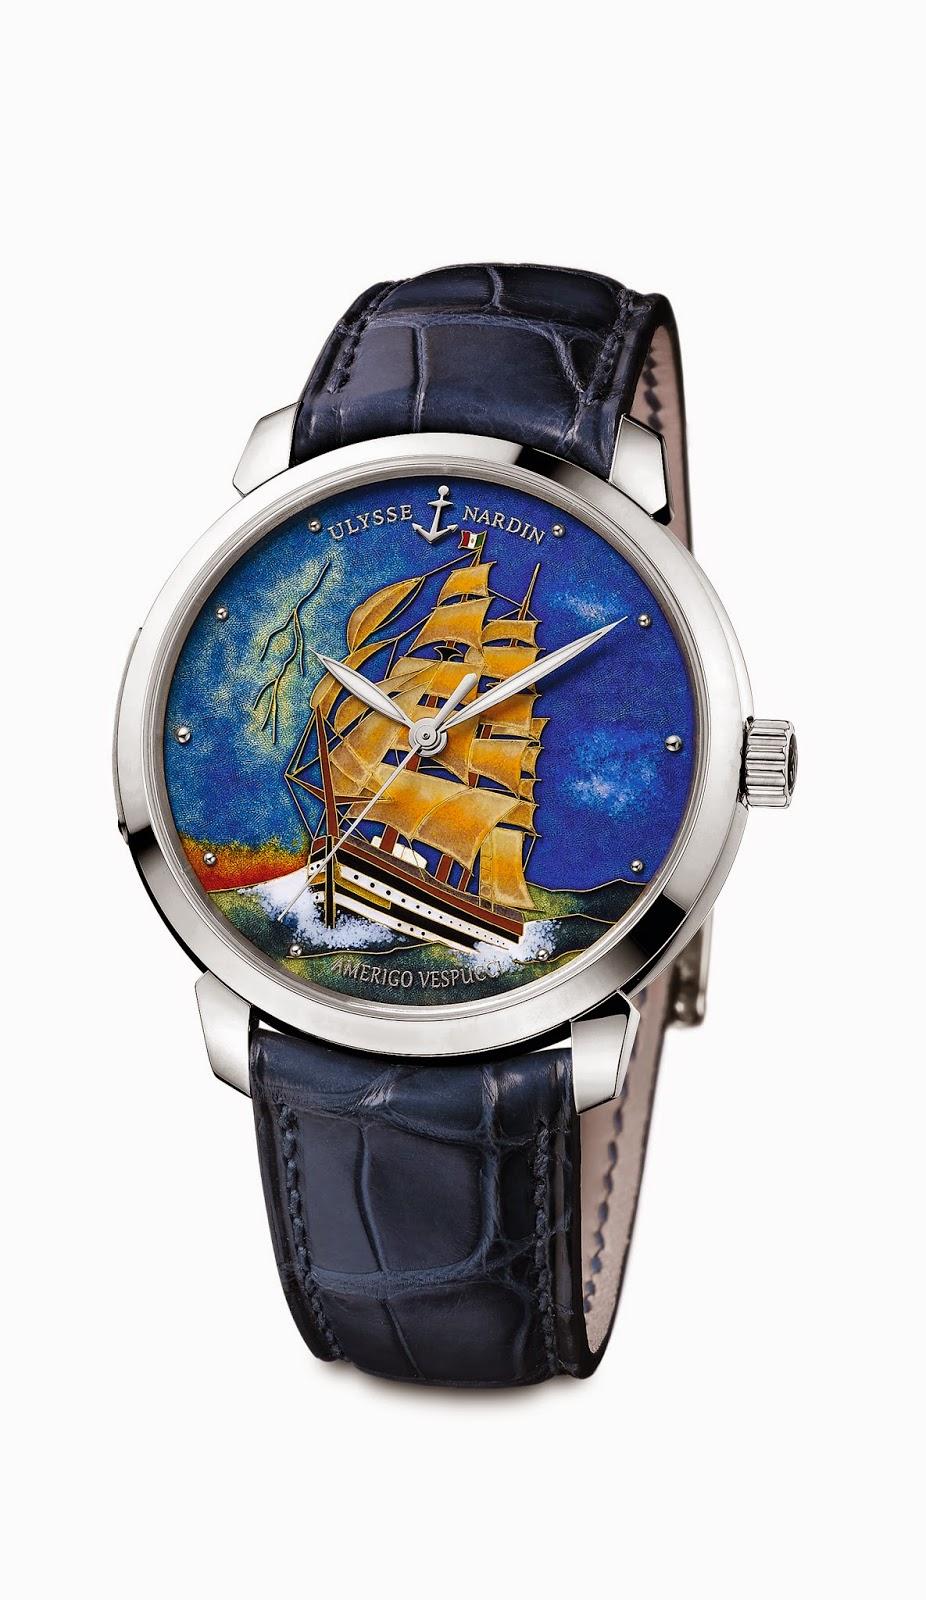 ULYSSE NARDIN reloj 14